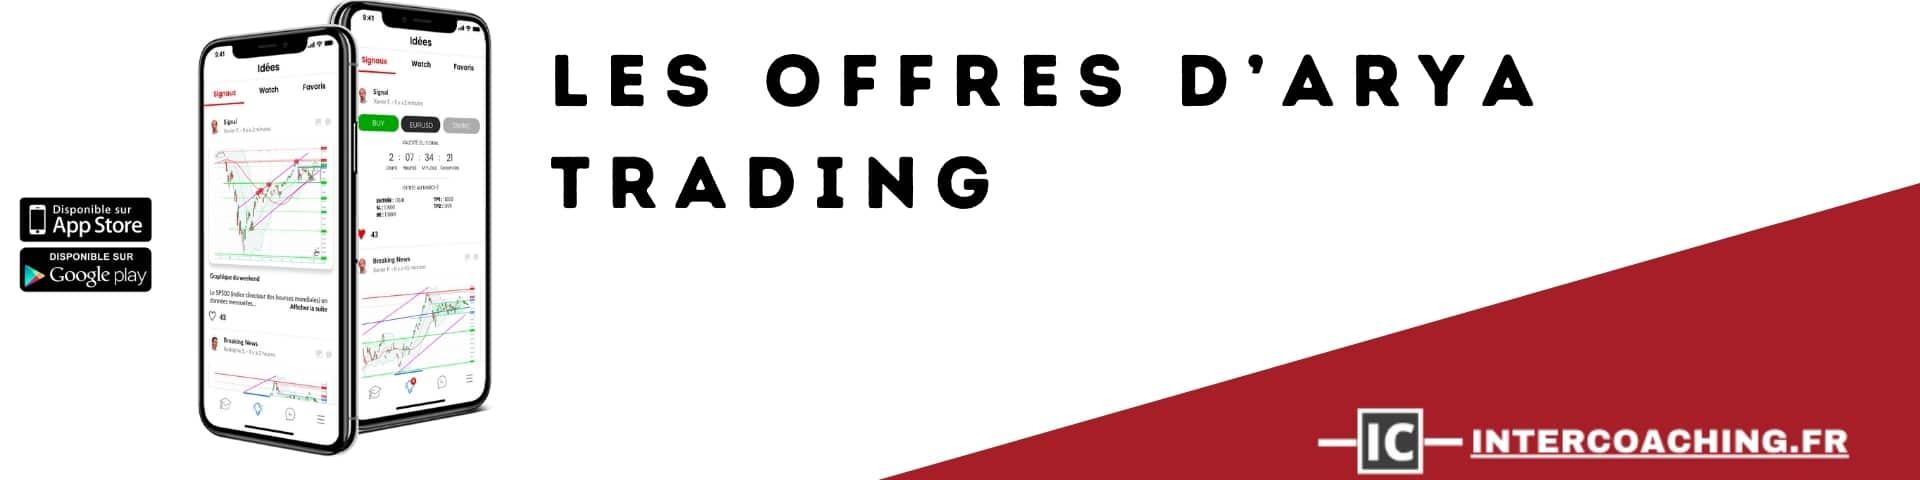 Les offres d'ARYA Trading